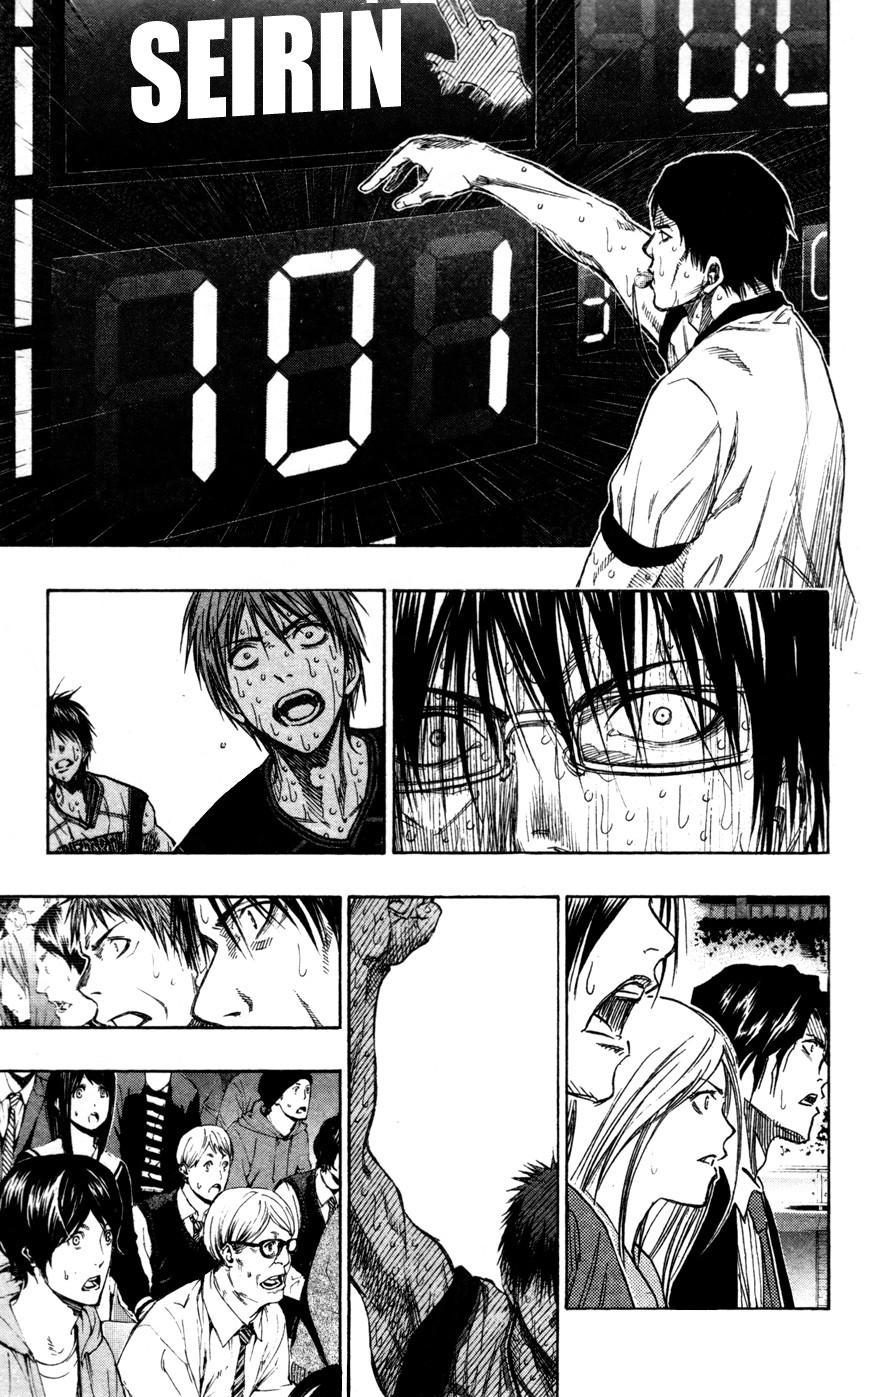 Kuroko no Basket Manga Chapter 139 - Image 06